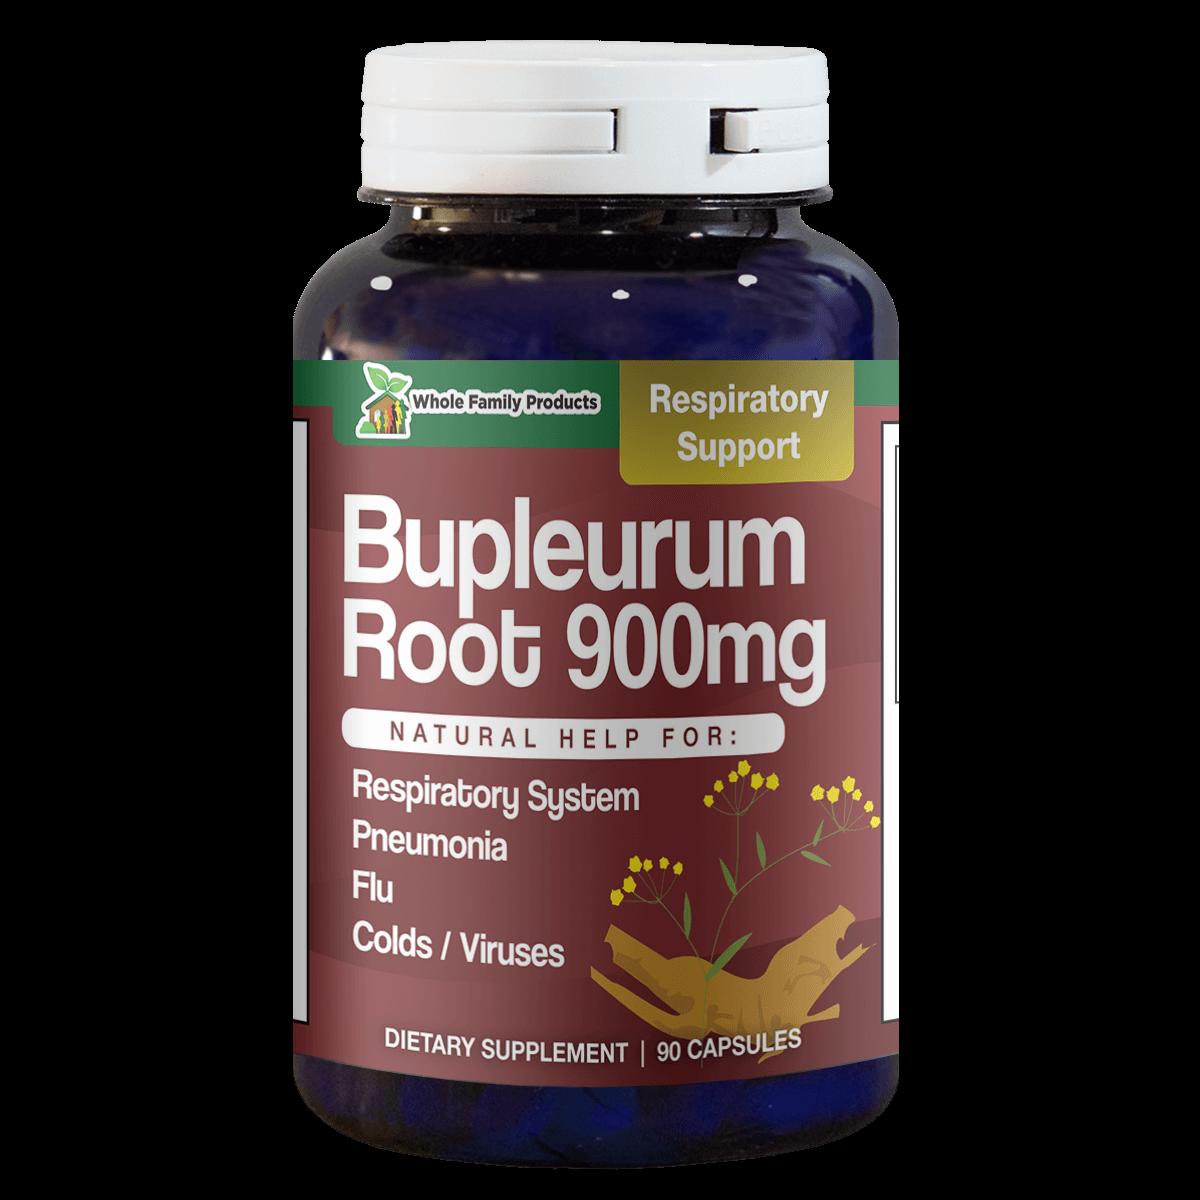 Bupleurum Root 900mg 90 Capsules Natural Help For Respiratory System and Pneumonia